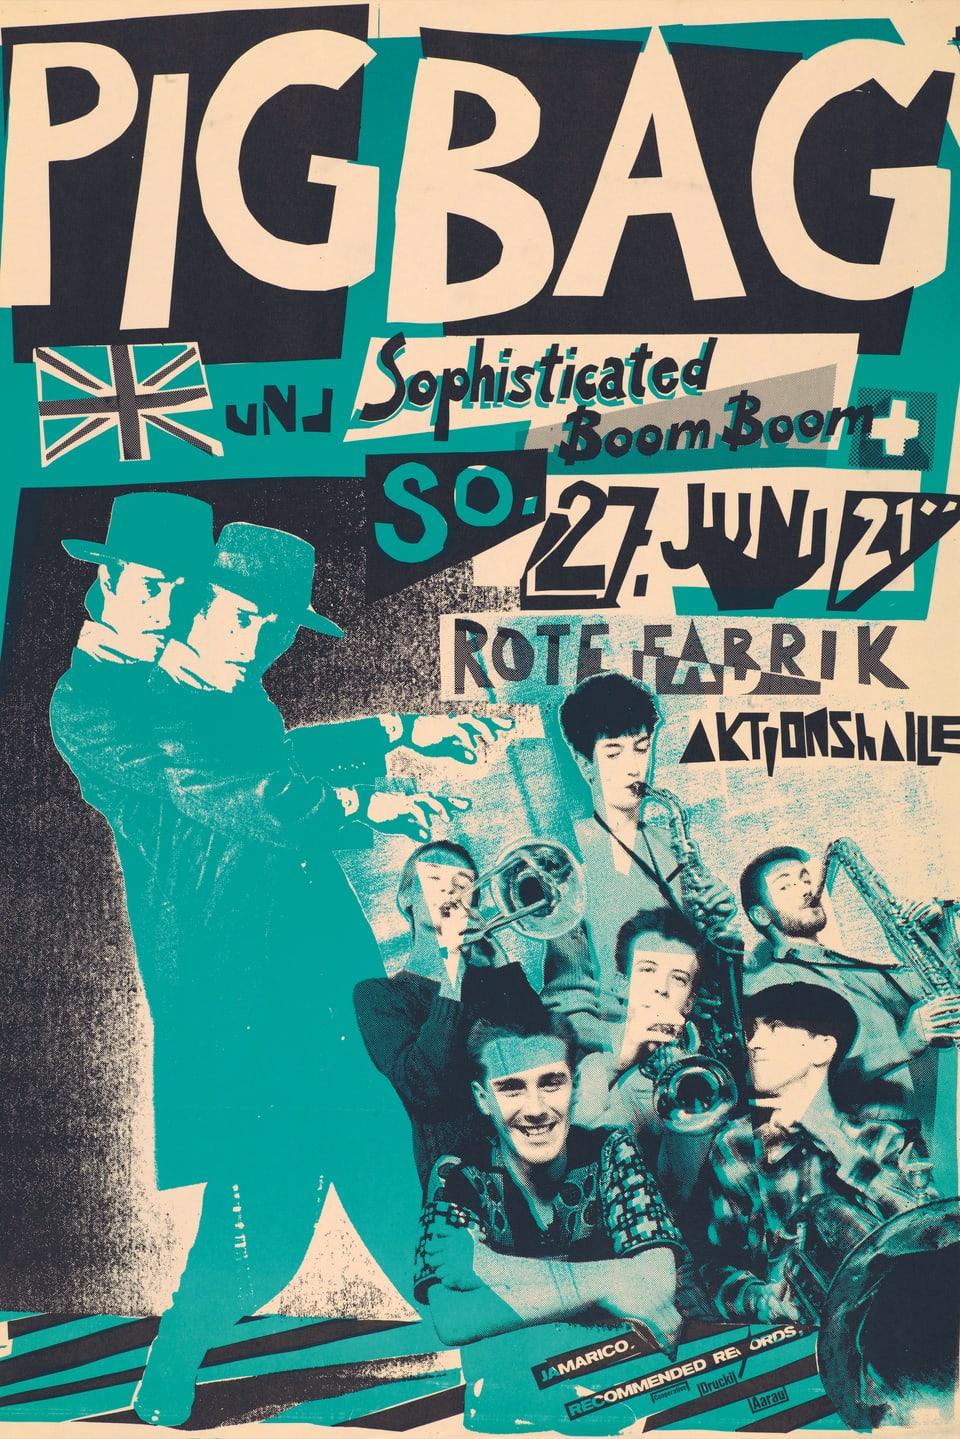 Konzertplakat der Band Pig Bag